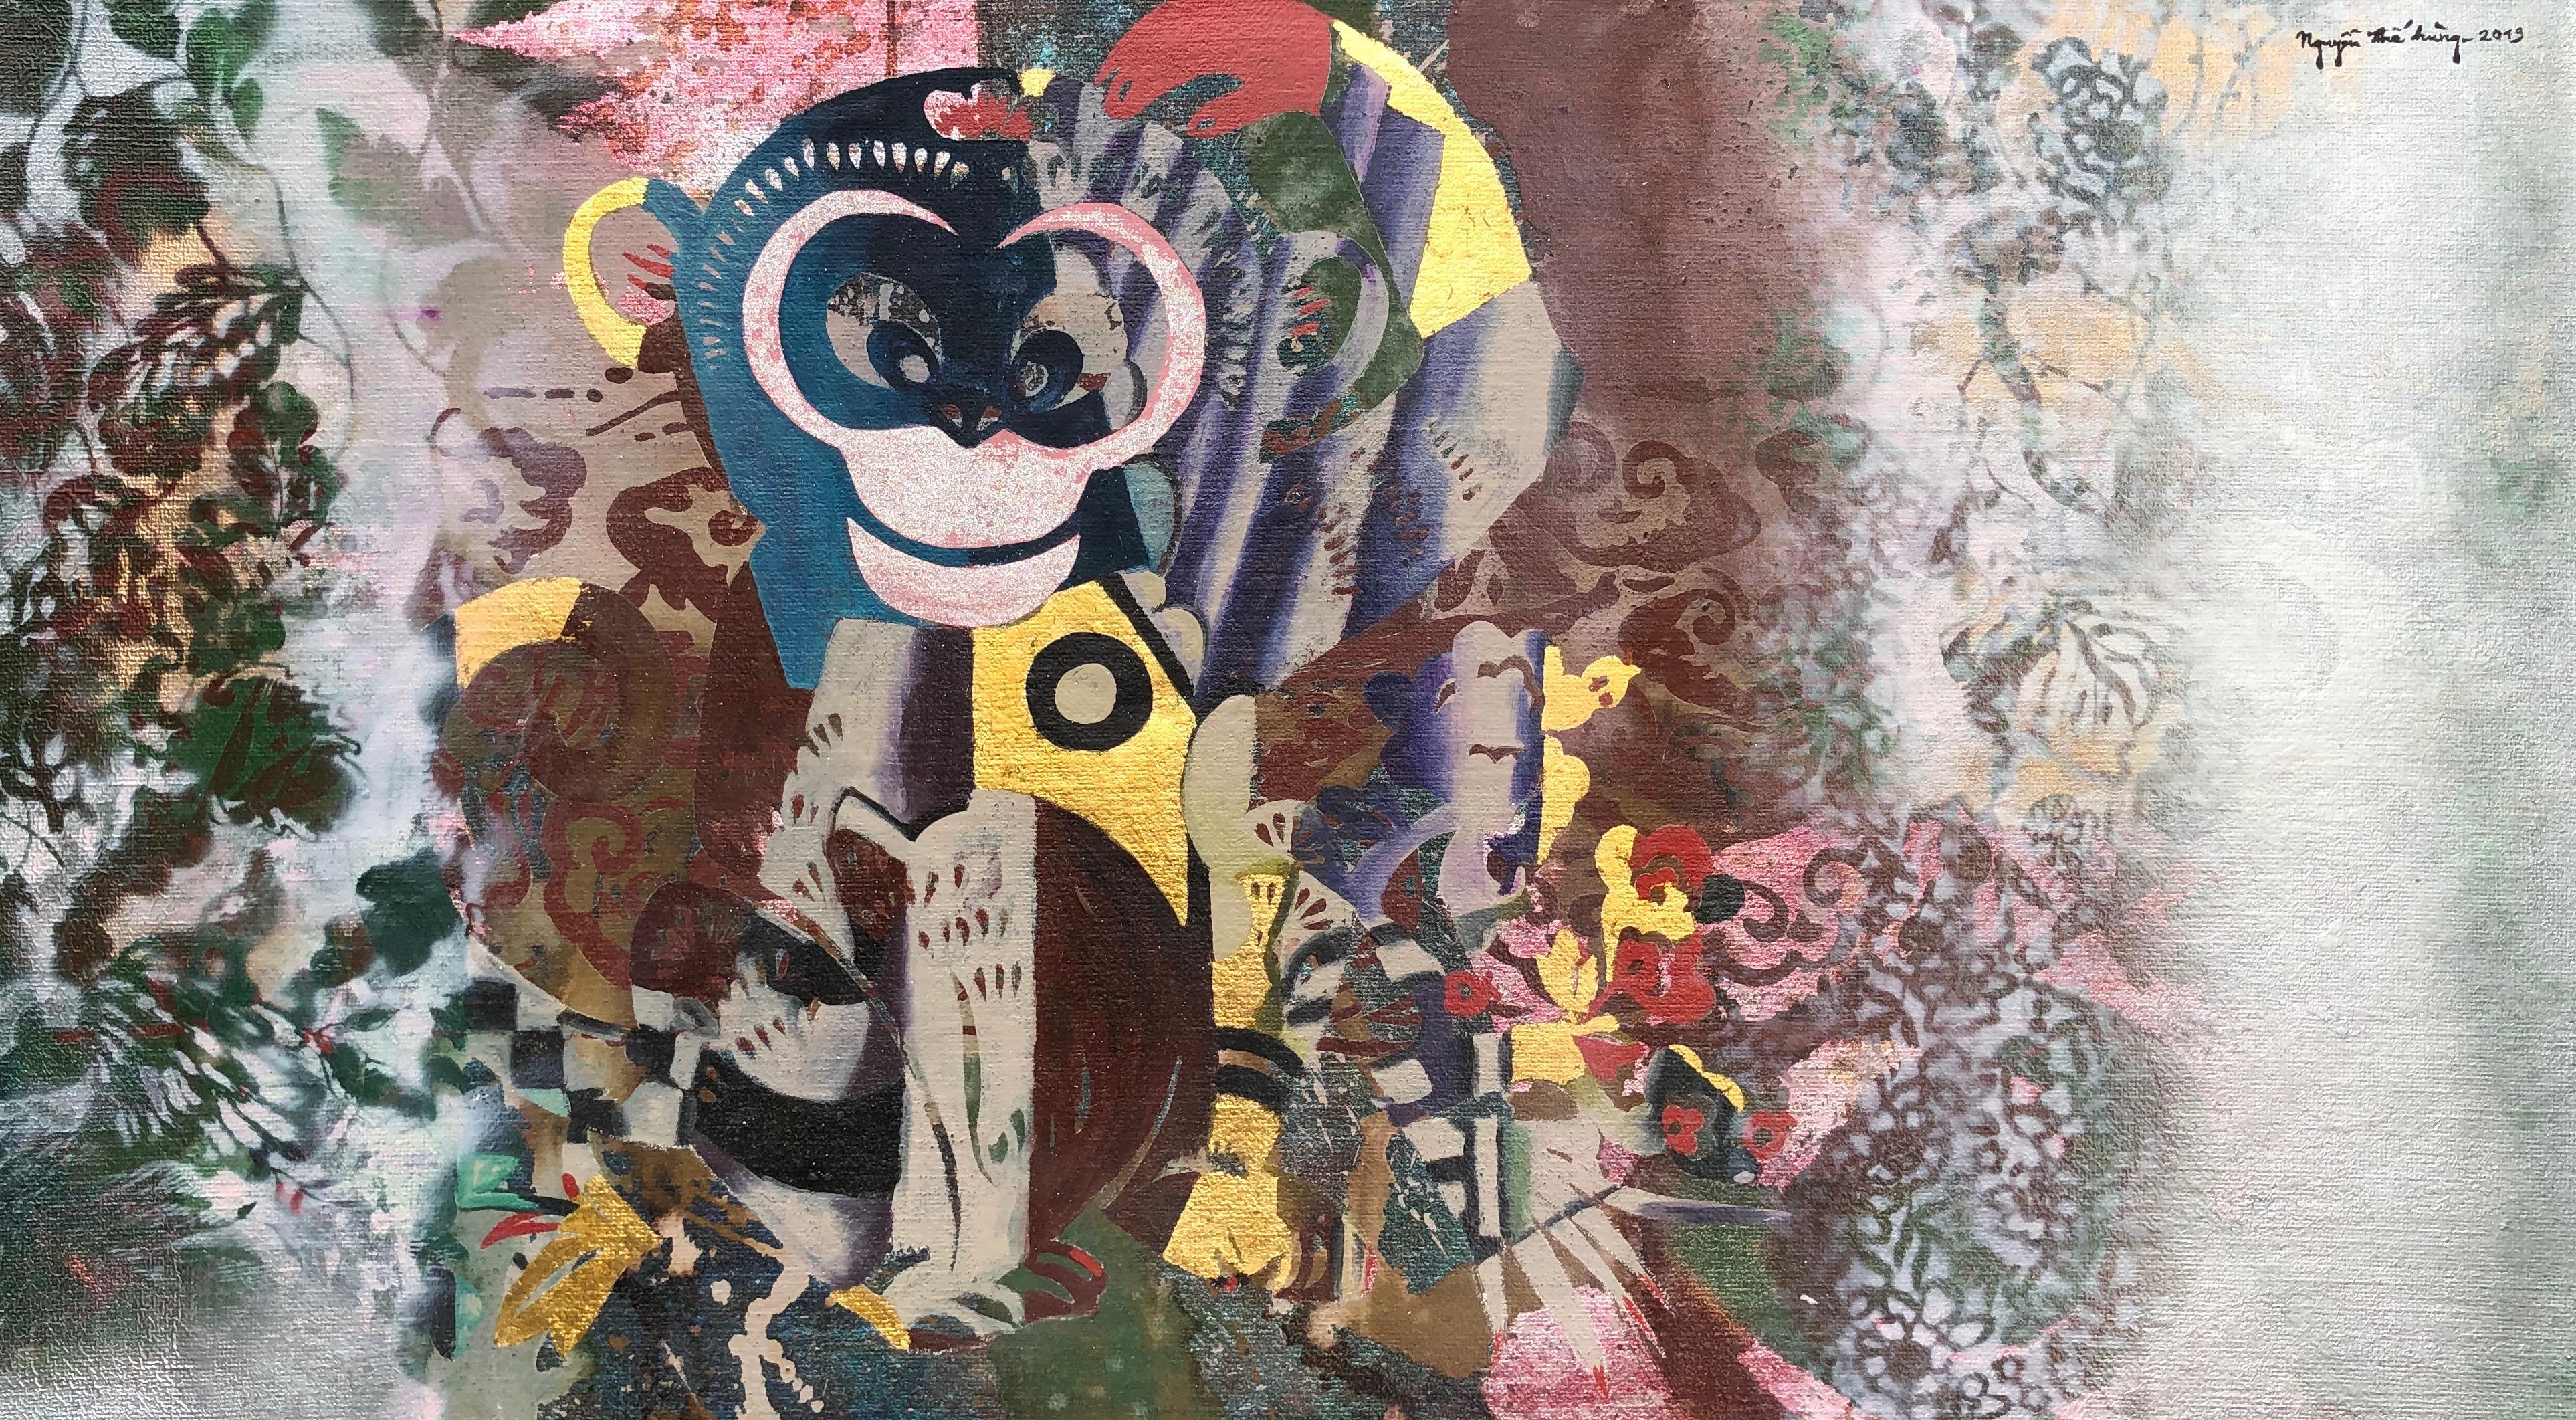 The Monkey | Thân